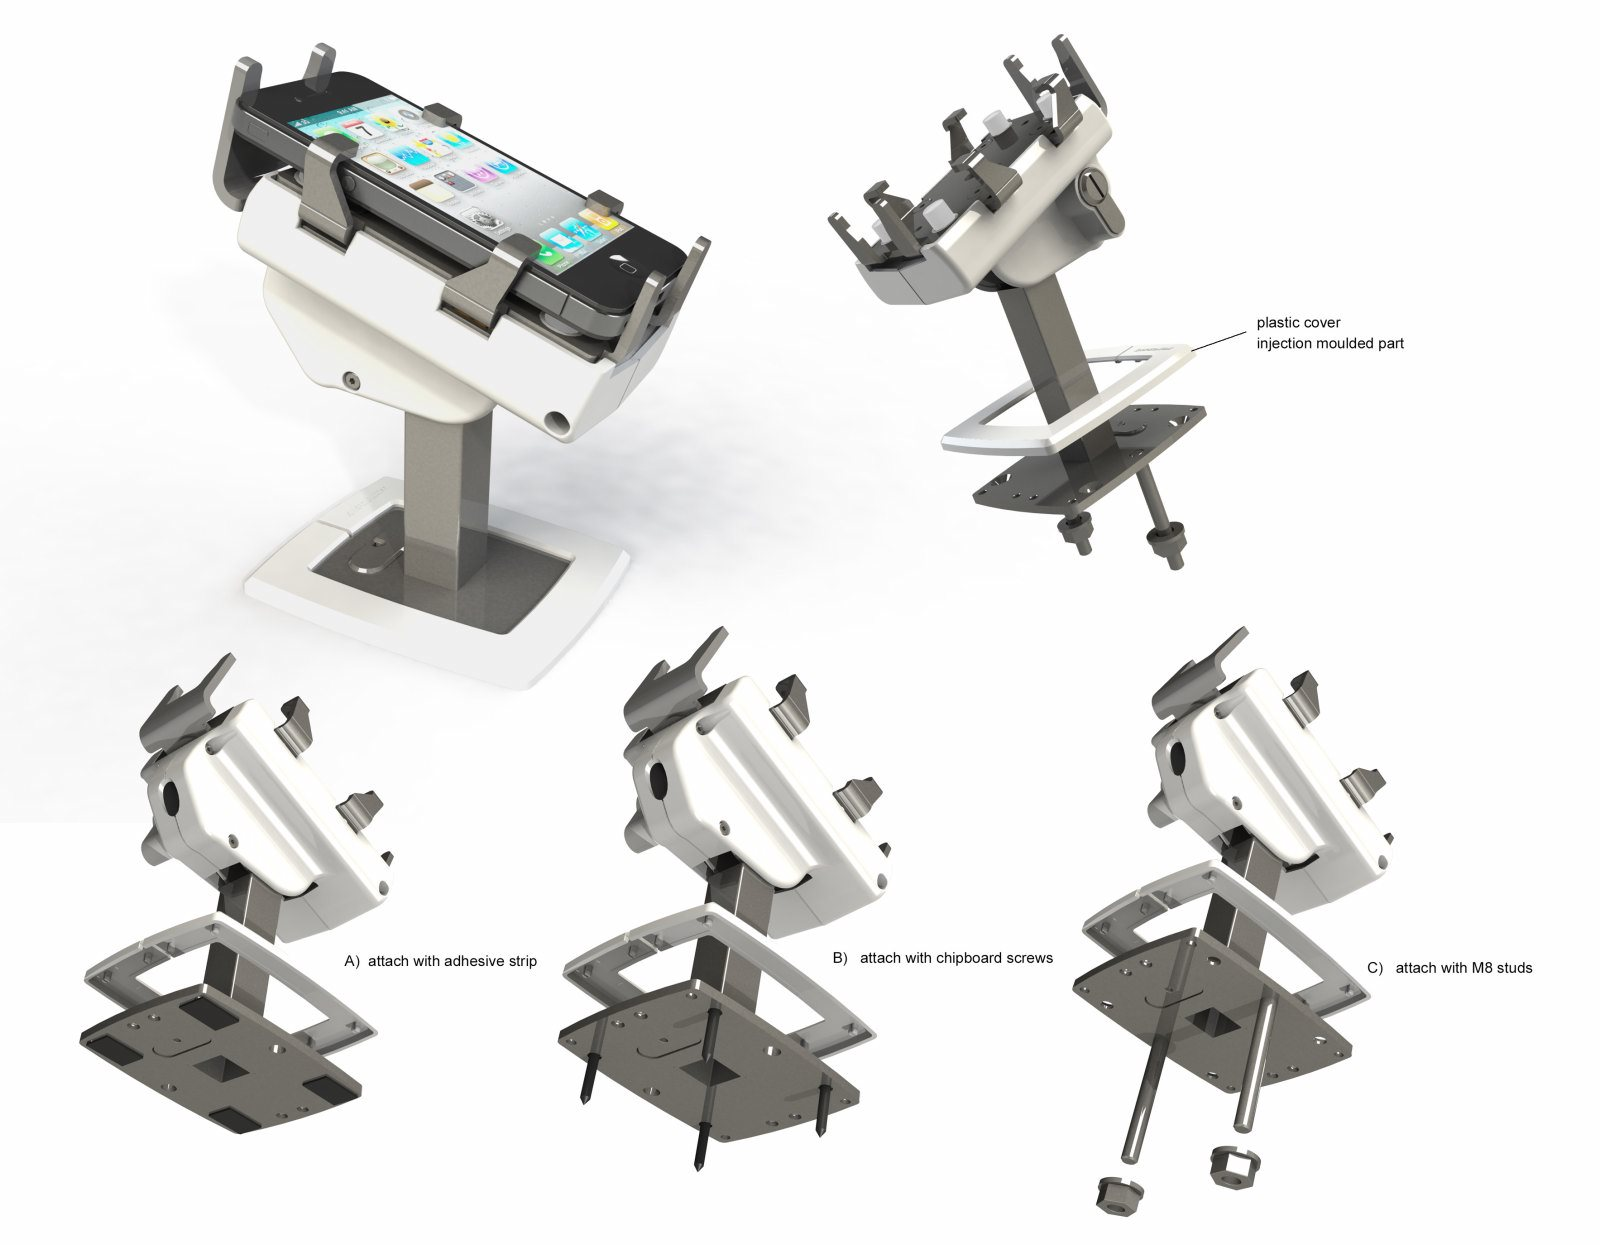 gripzo-mounting-options-gorilla-grip-240913.jpg